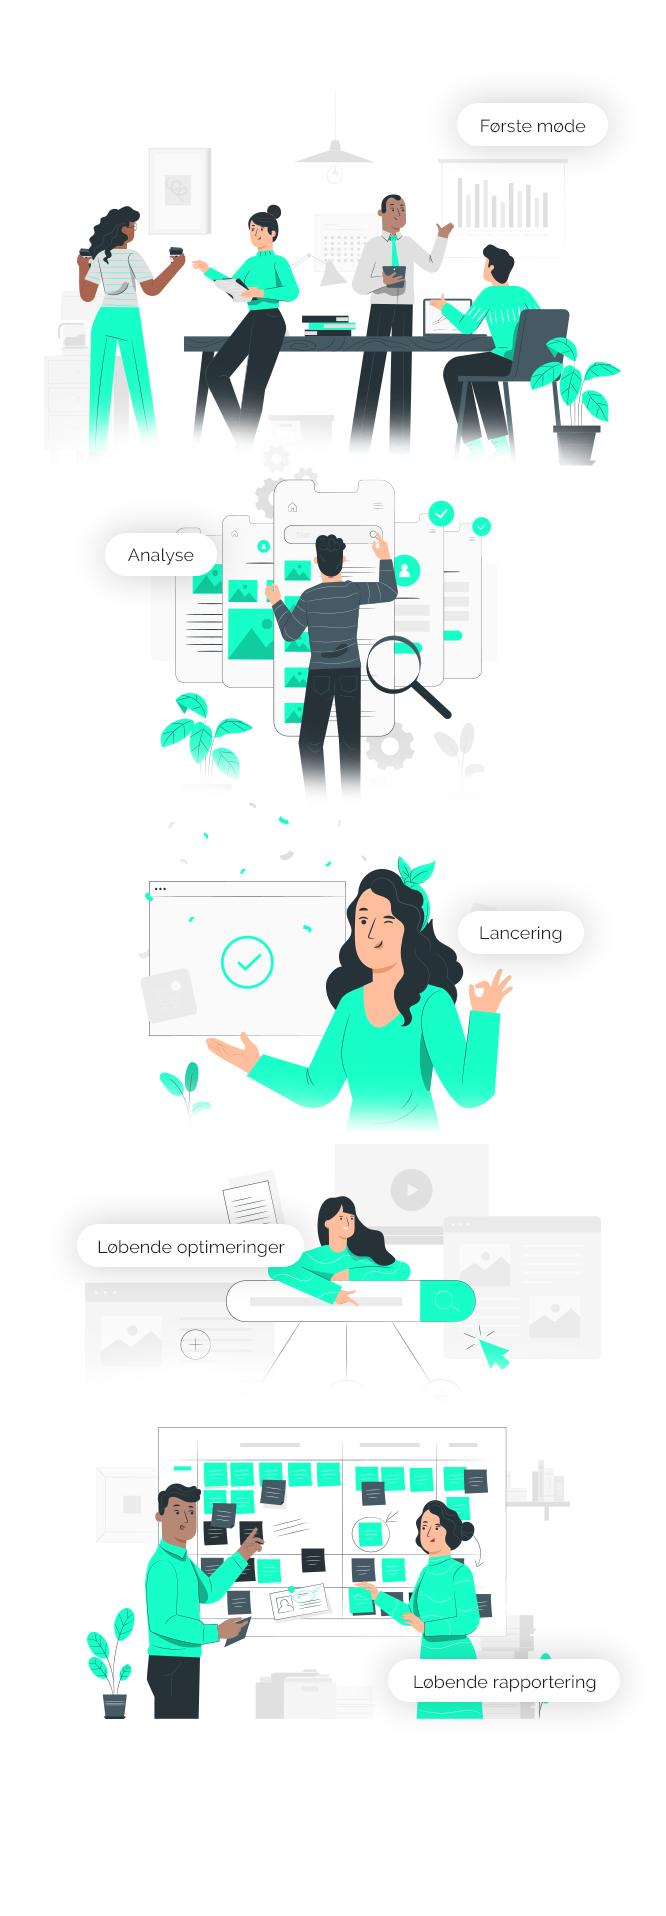 Online markedsførings processen mobil